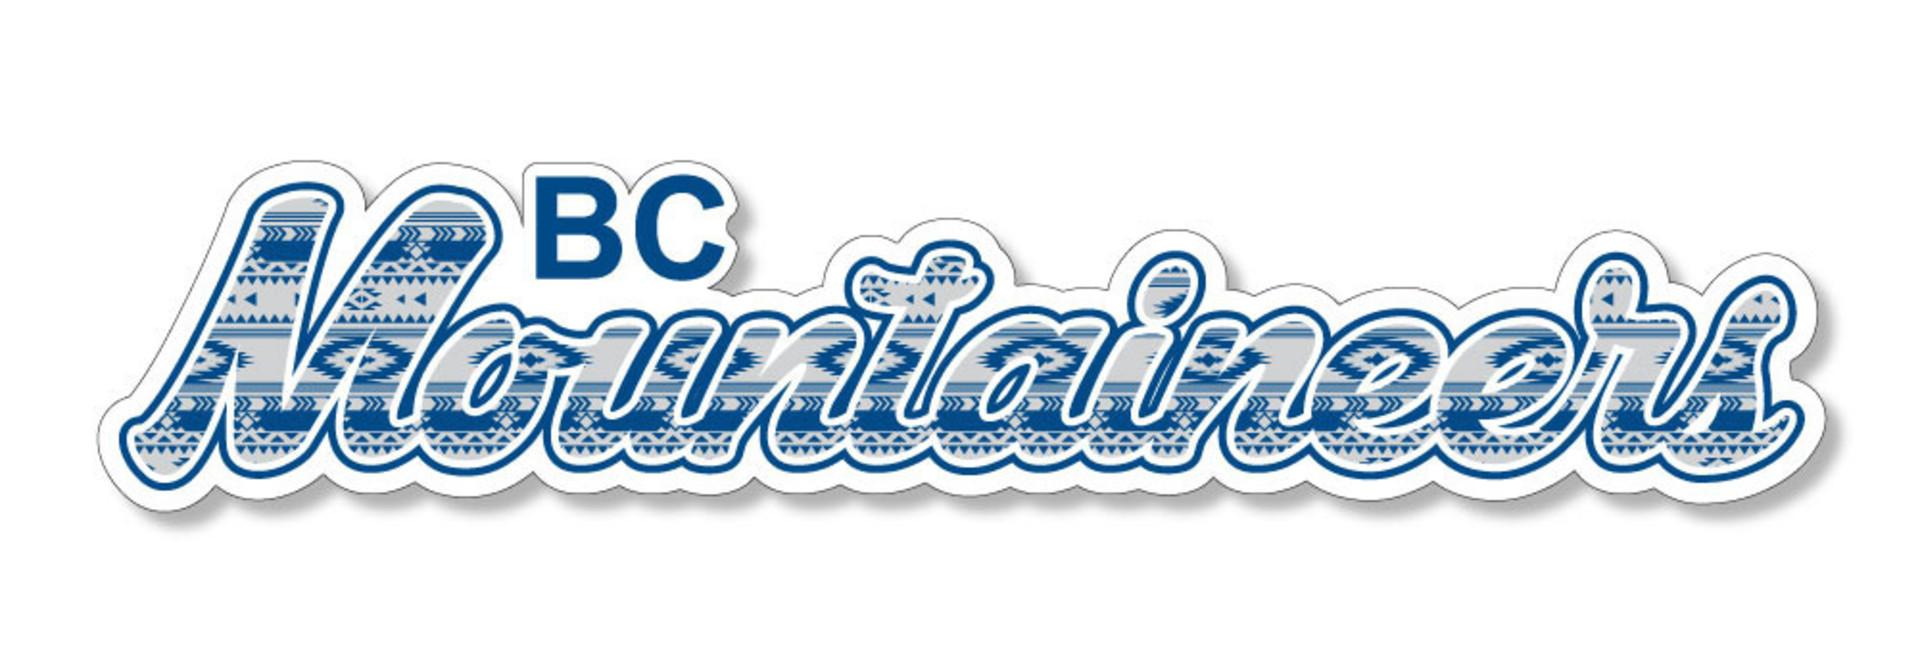 BC Mountaineers Dizzler Sticker